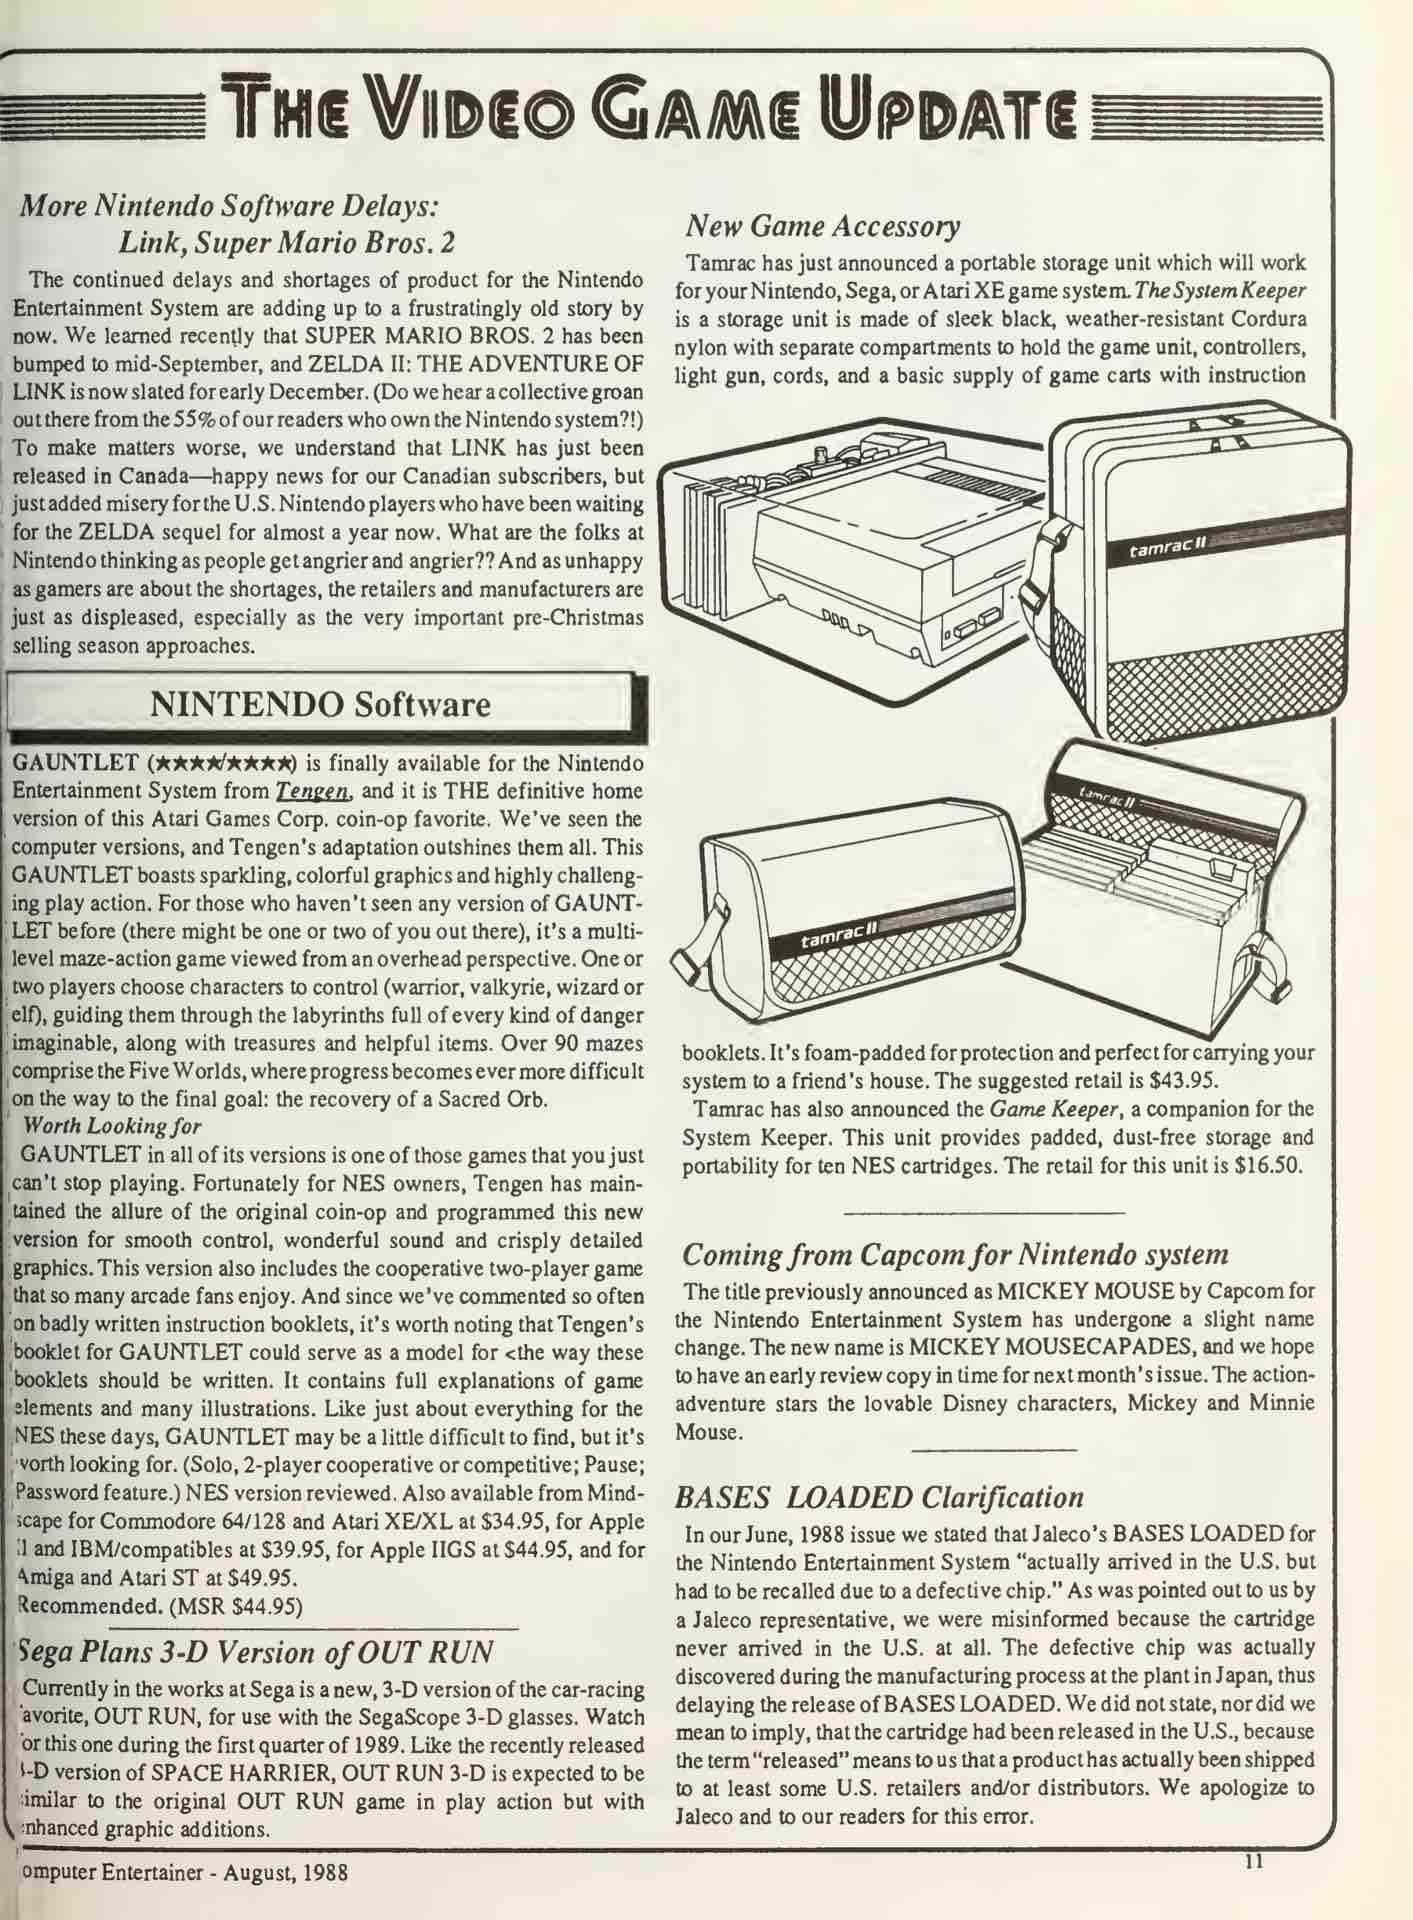 Computer Entertainer | August 1988 u2013 pg 11  sc 1 st  Nintendo Times & Computer Entertainer | August 1988 u2013 pg 11 u2013 Nintendo Times